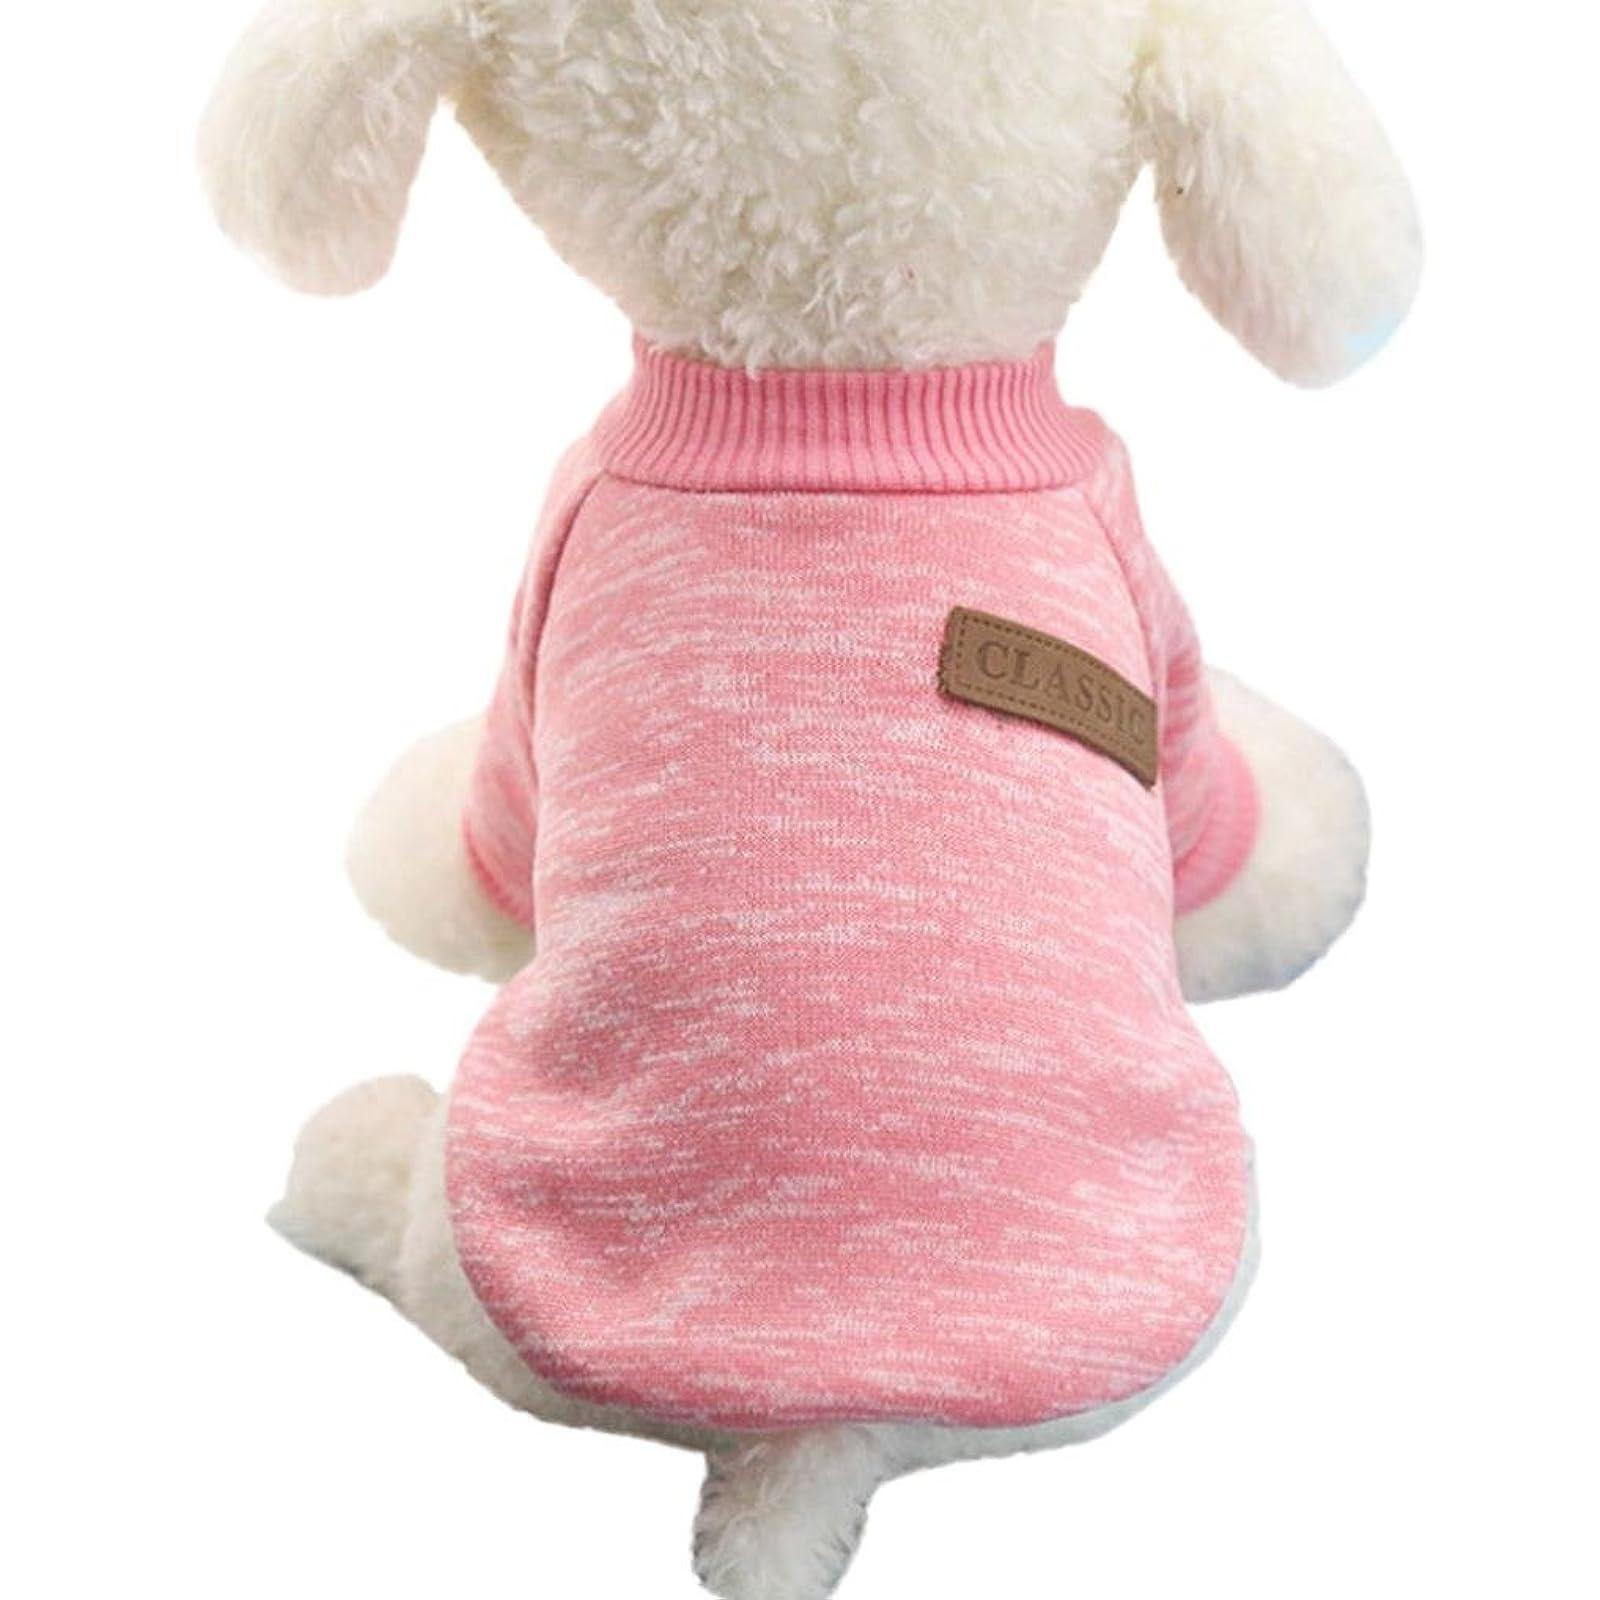 MALLOOM Pet Dog Puppy Classic Sweater Coat MALLOOM00001775 - 1